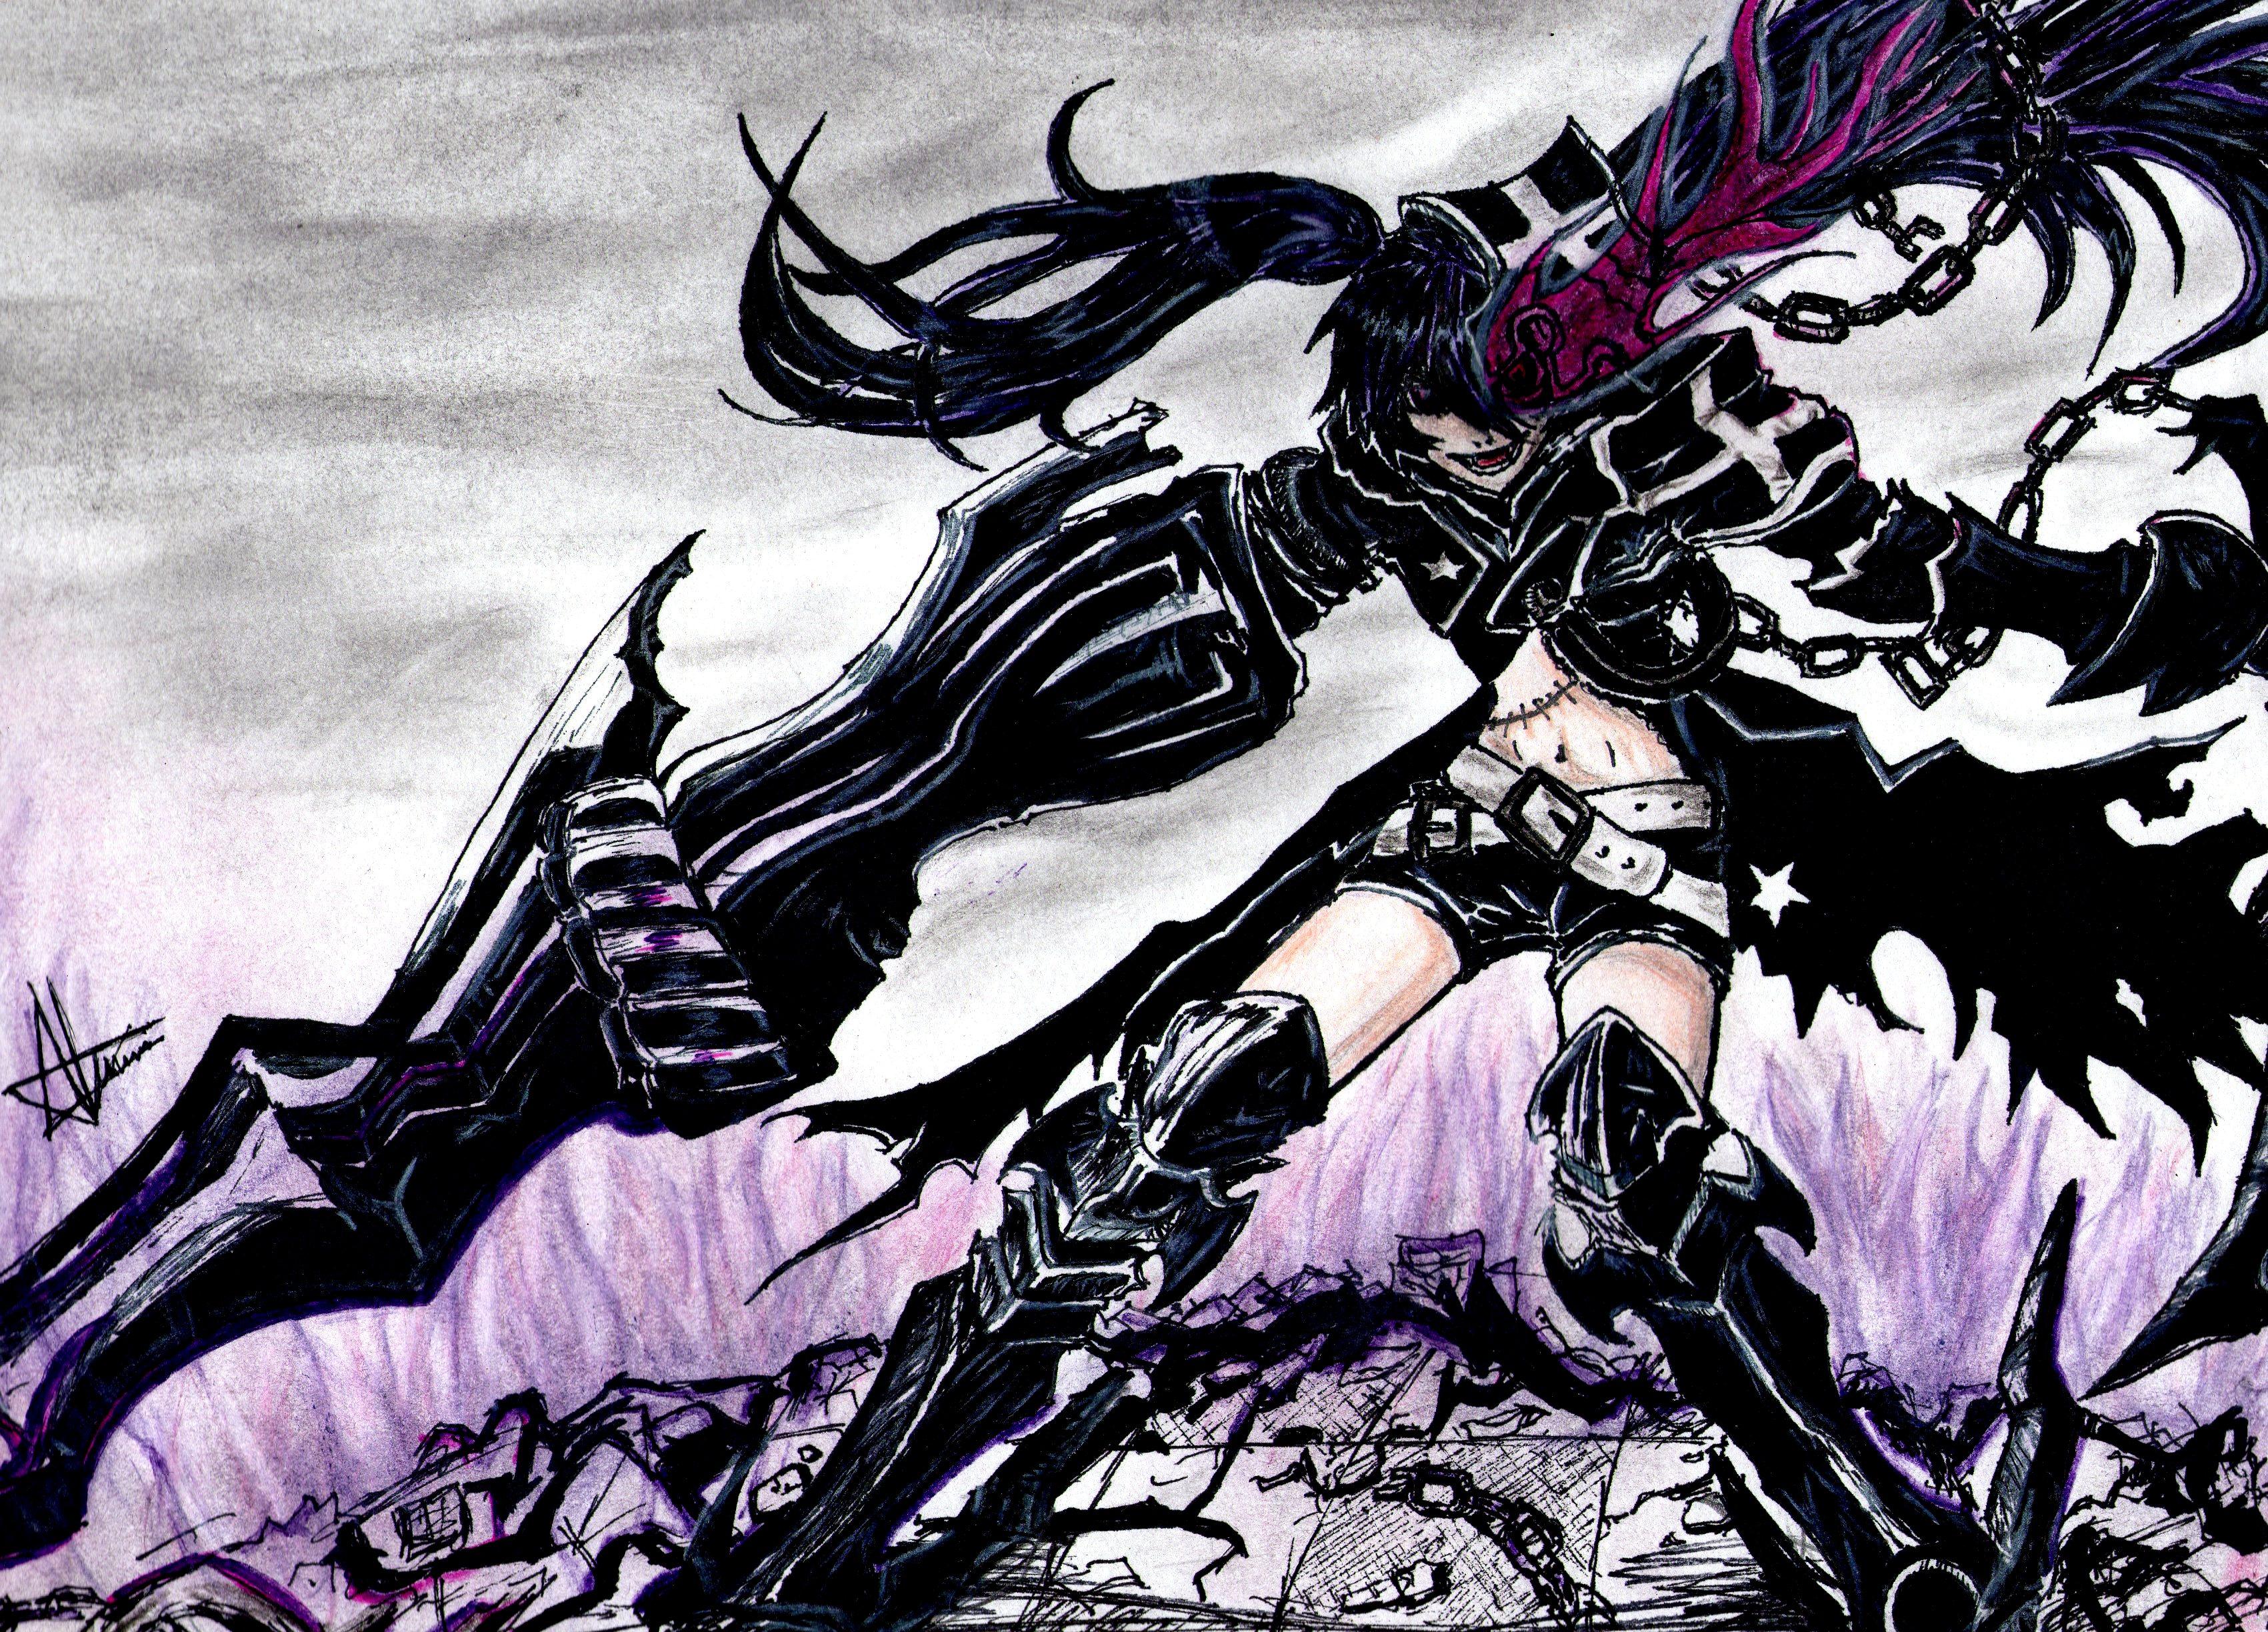 Insane Black Rock Shooter Background